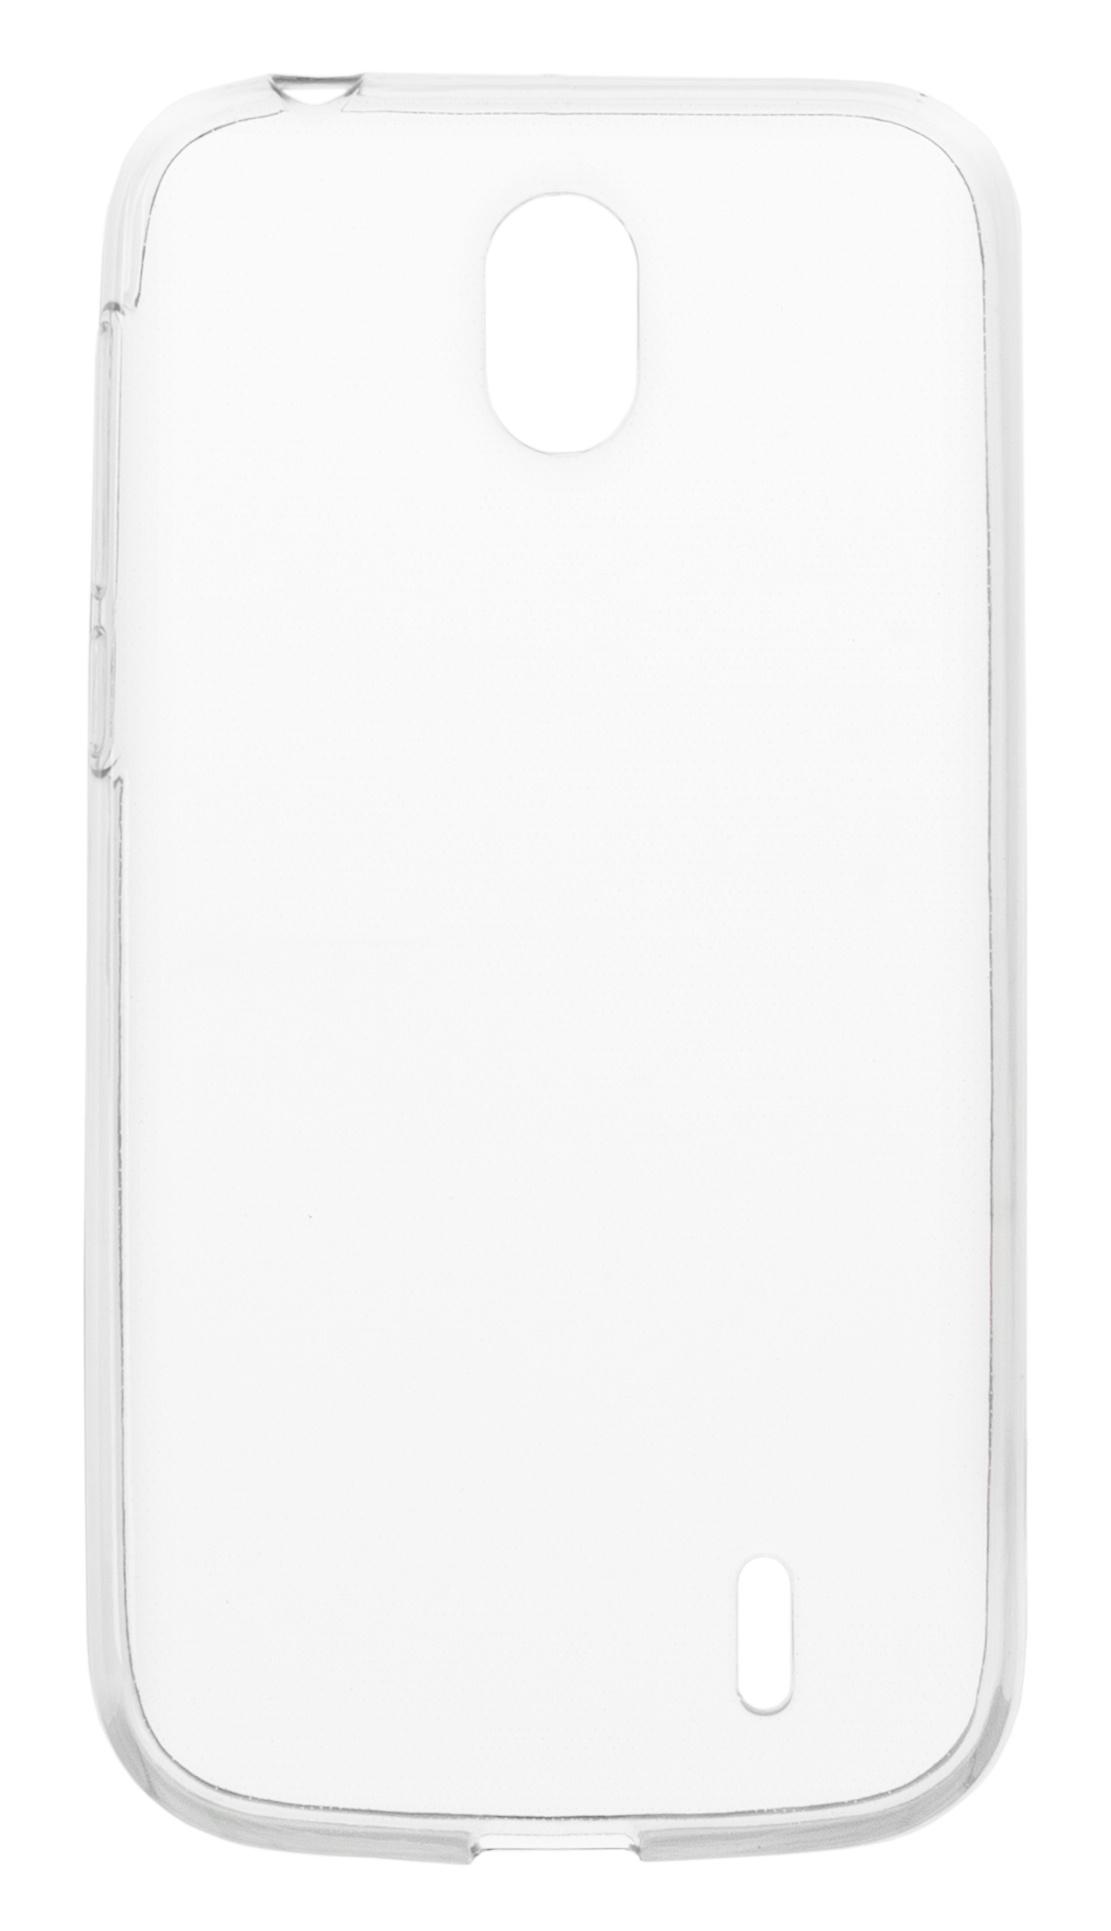 Накладка Skinbox Slim Silicone для Nokia 1, 4660041403619, прозрачный skinbox накладка skinbox slim silicone для lg v20